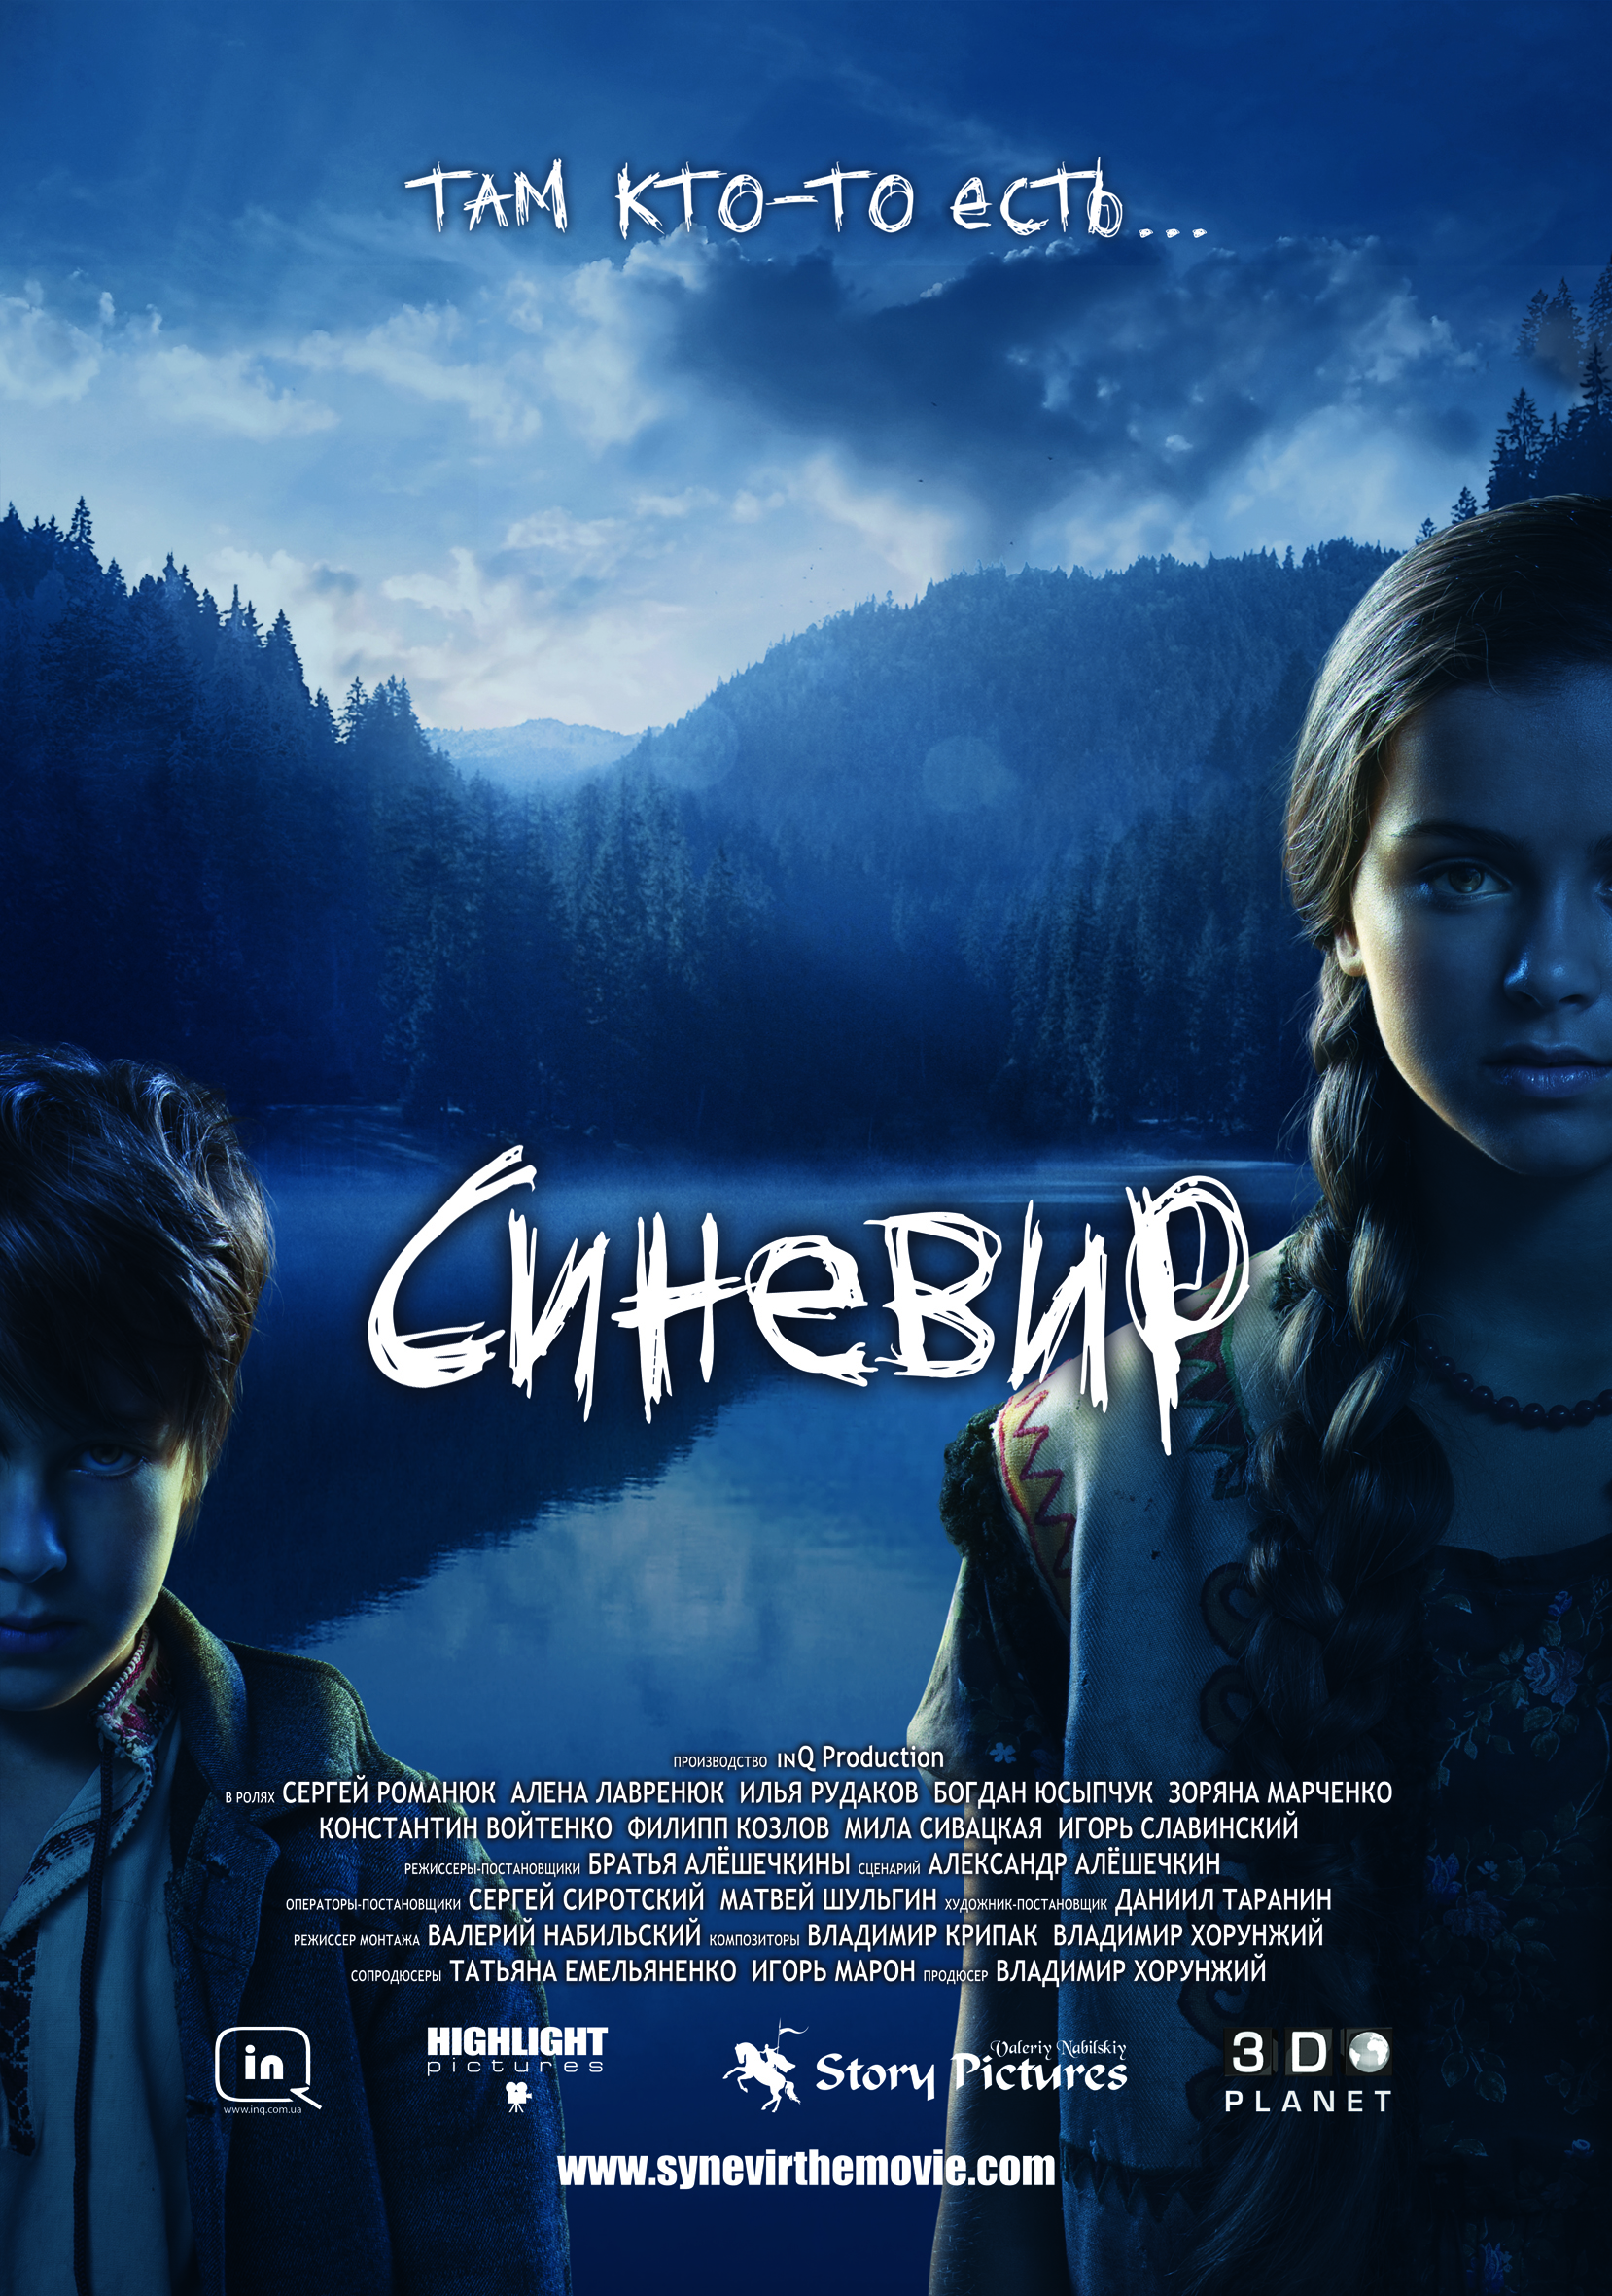 Новинки Кино 2013 Без Регистрации И Без Смс